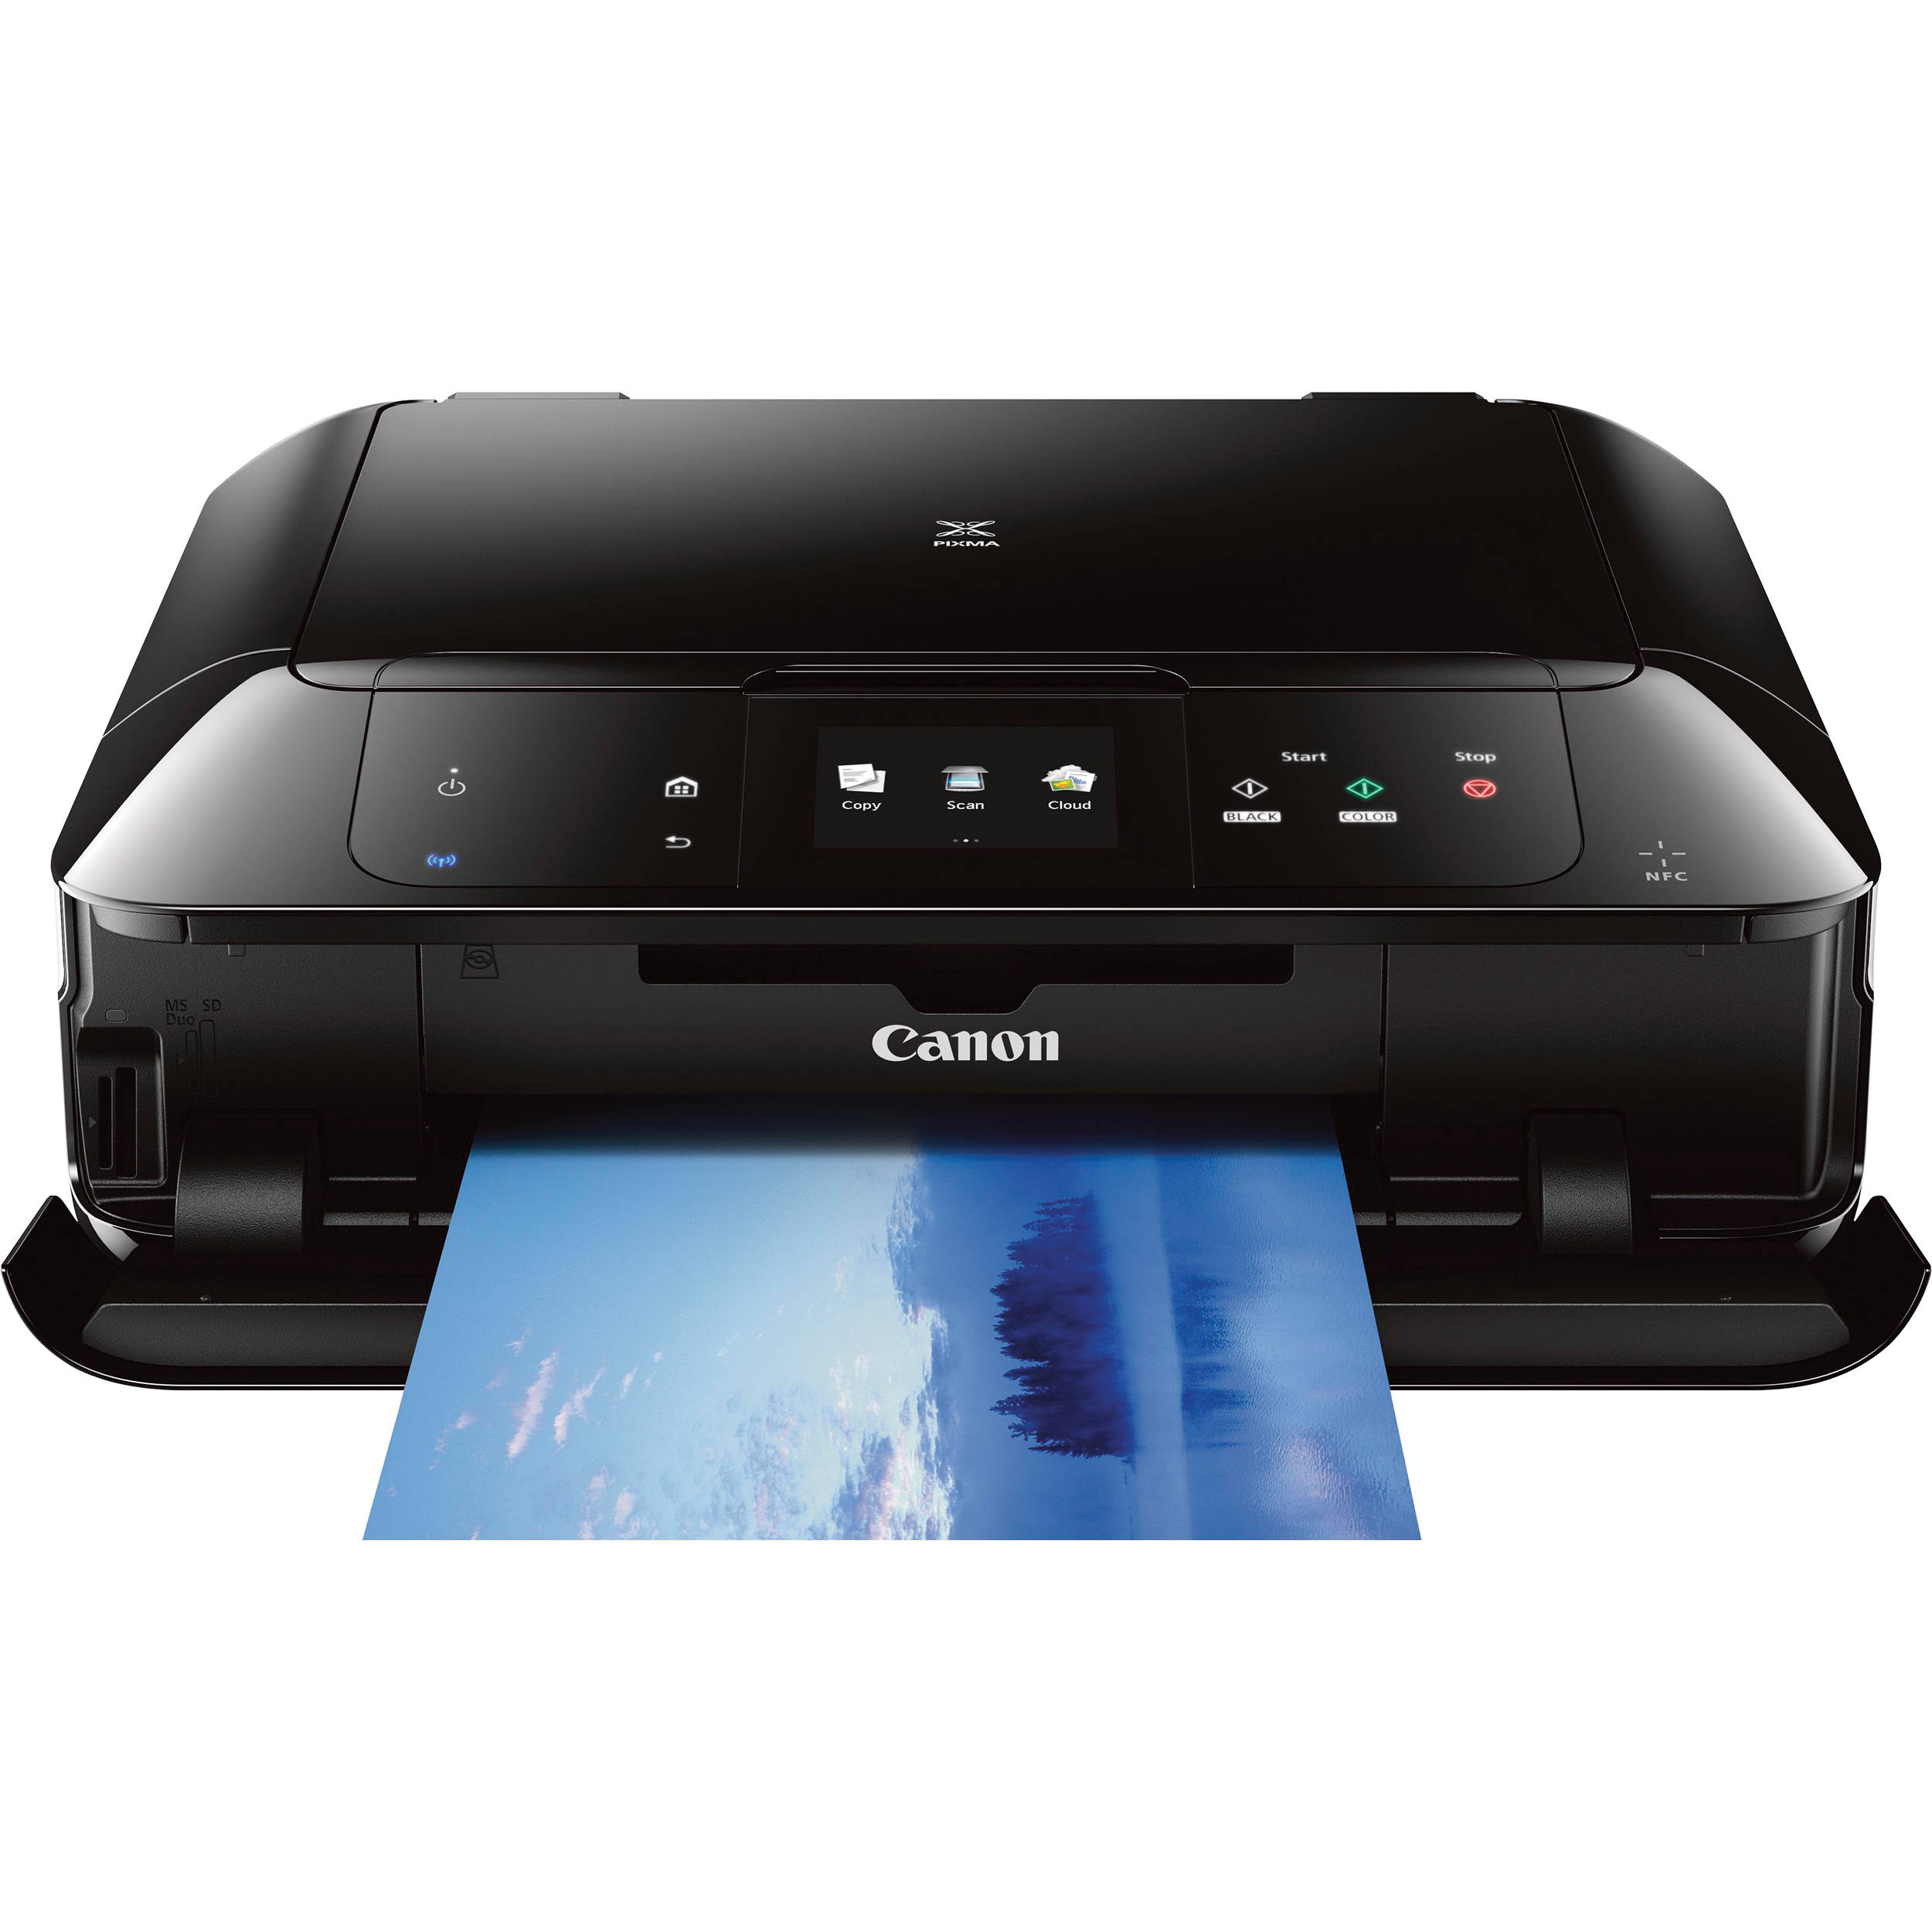 Wireless Printers: Canon All In One Wireless Printers